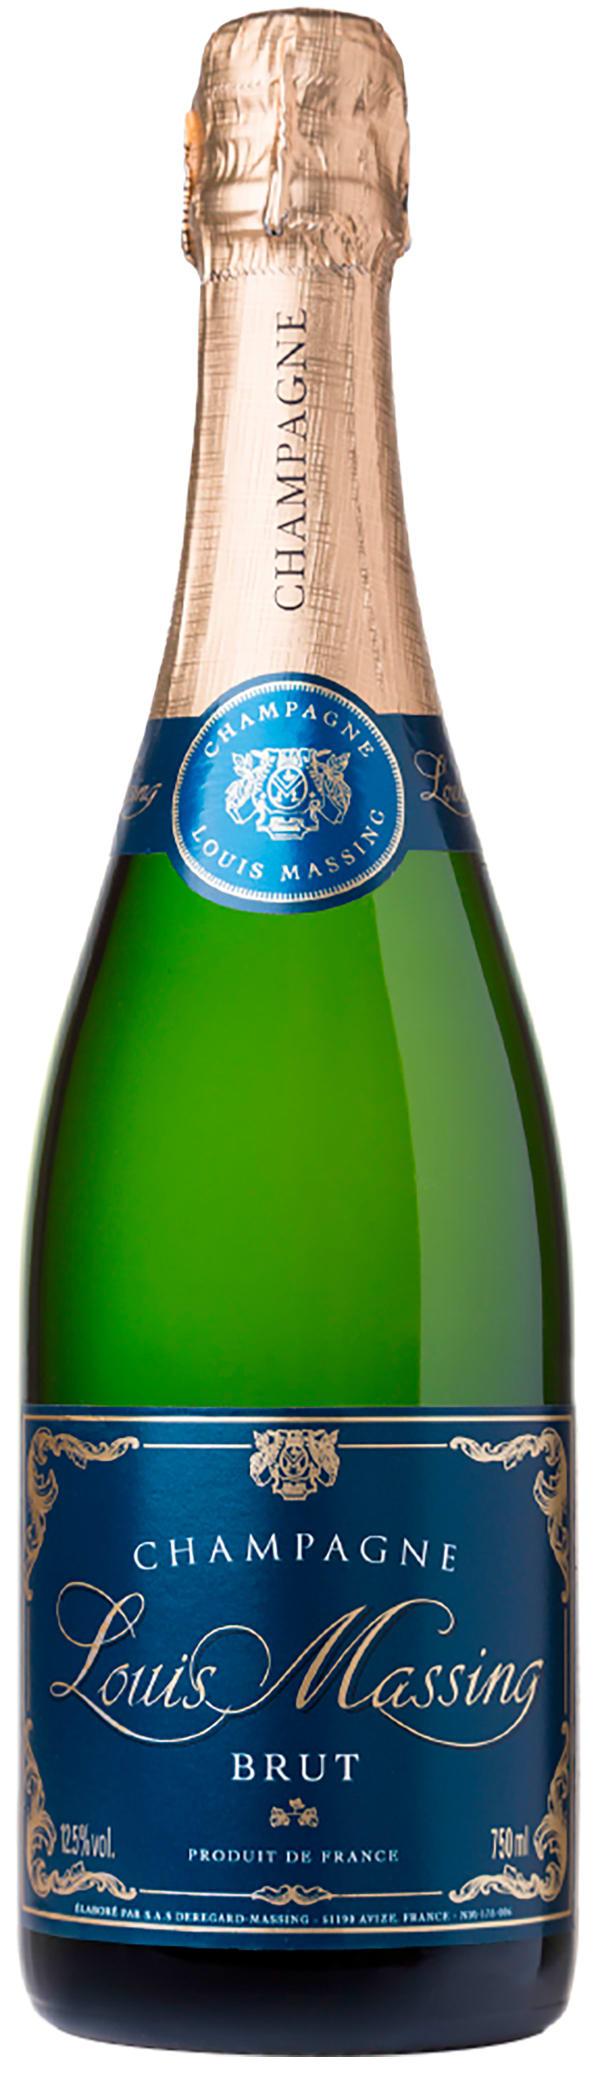 Louis Massing Champagne Brut